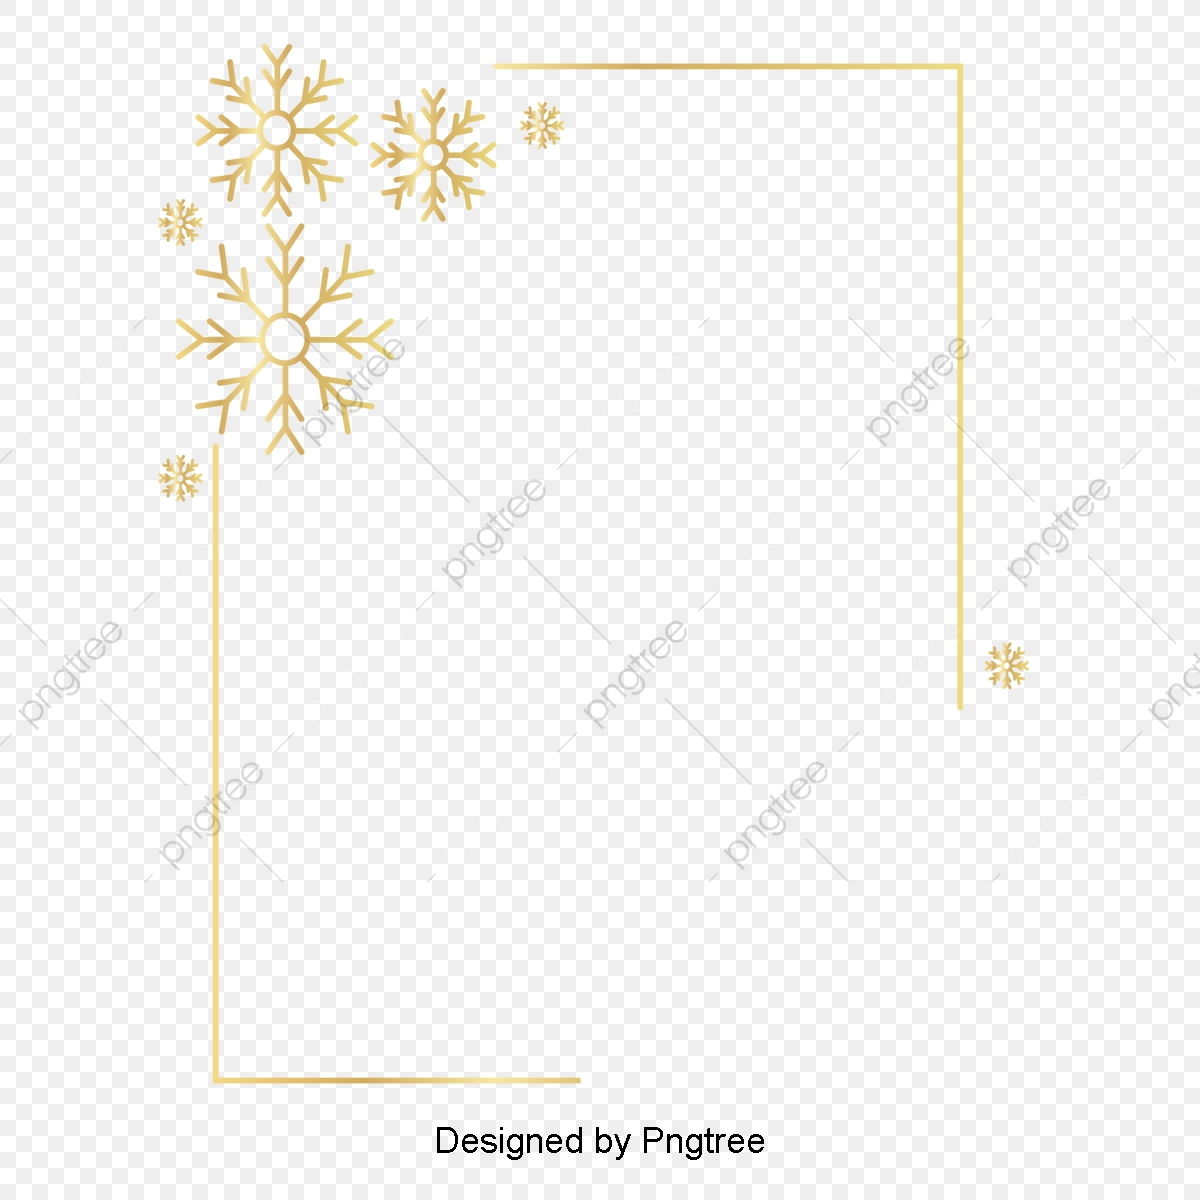 Flowery Frame 2 Clip Arts اطار ذهبي